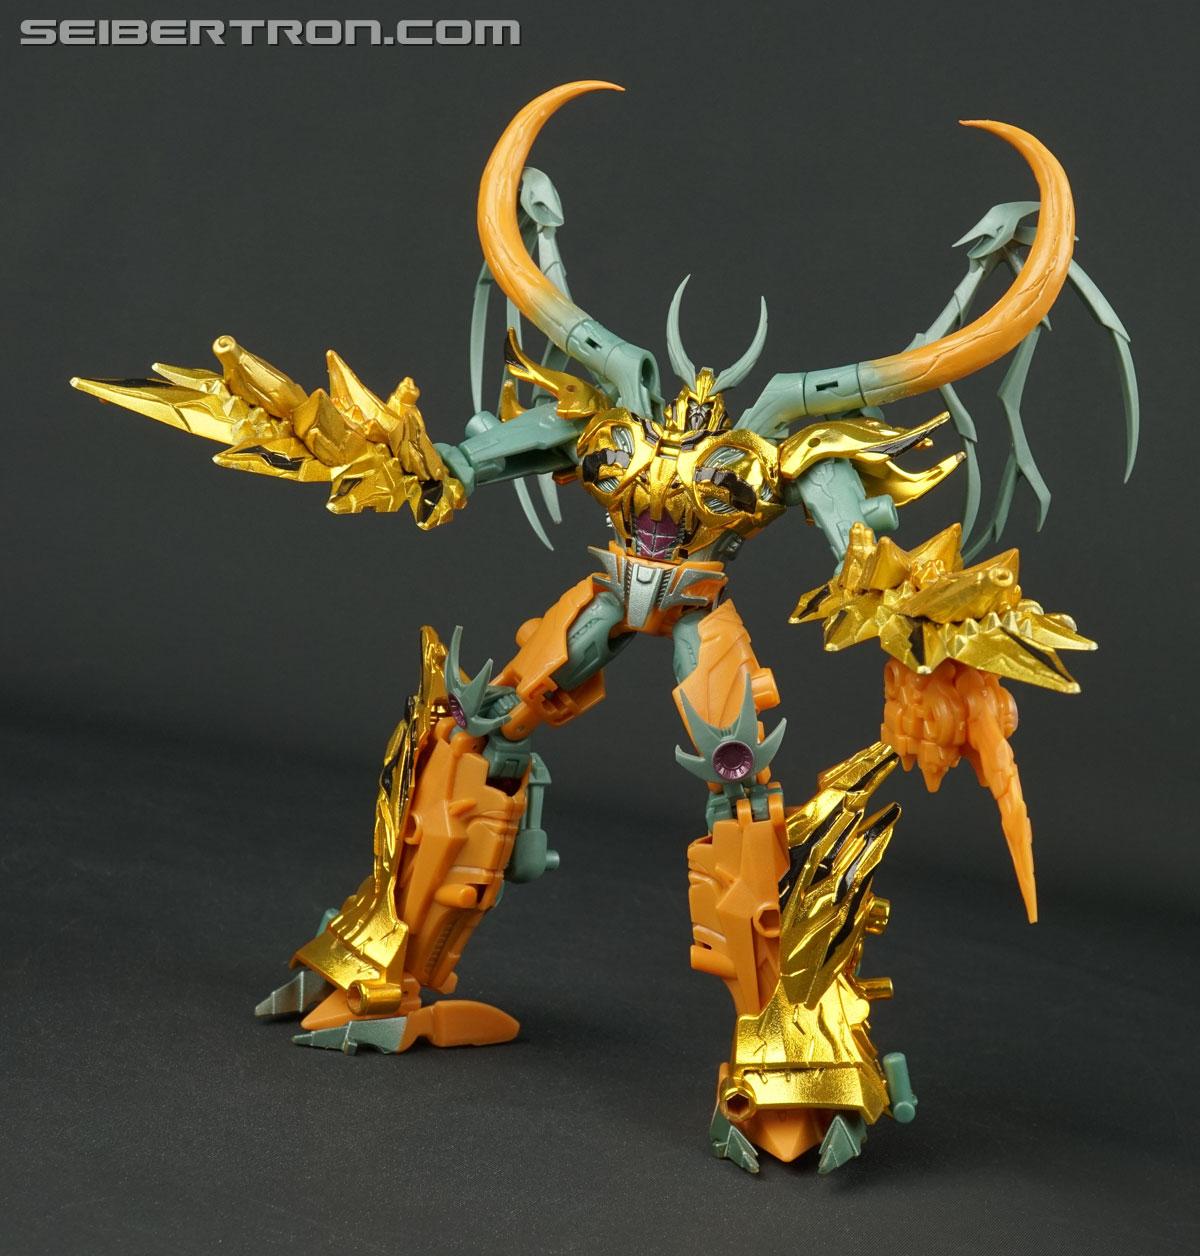 Transformers Arms Micron Gaia Unicron (Image #133 of 201)